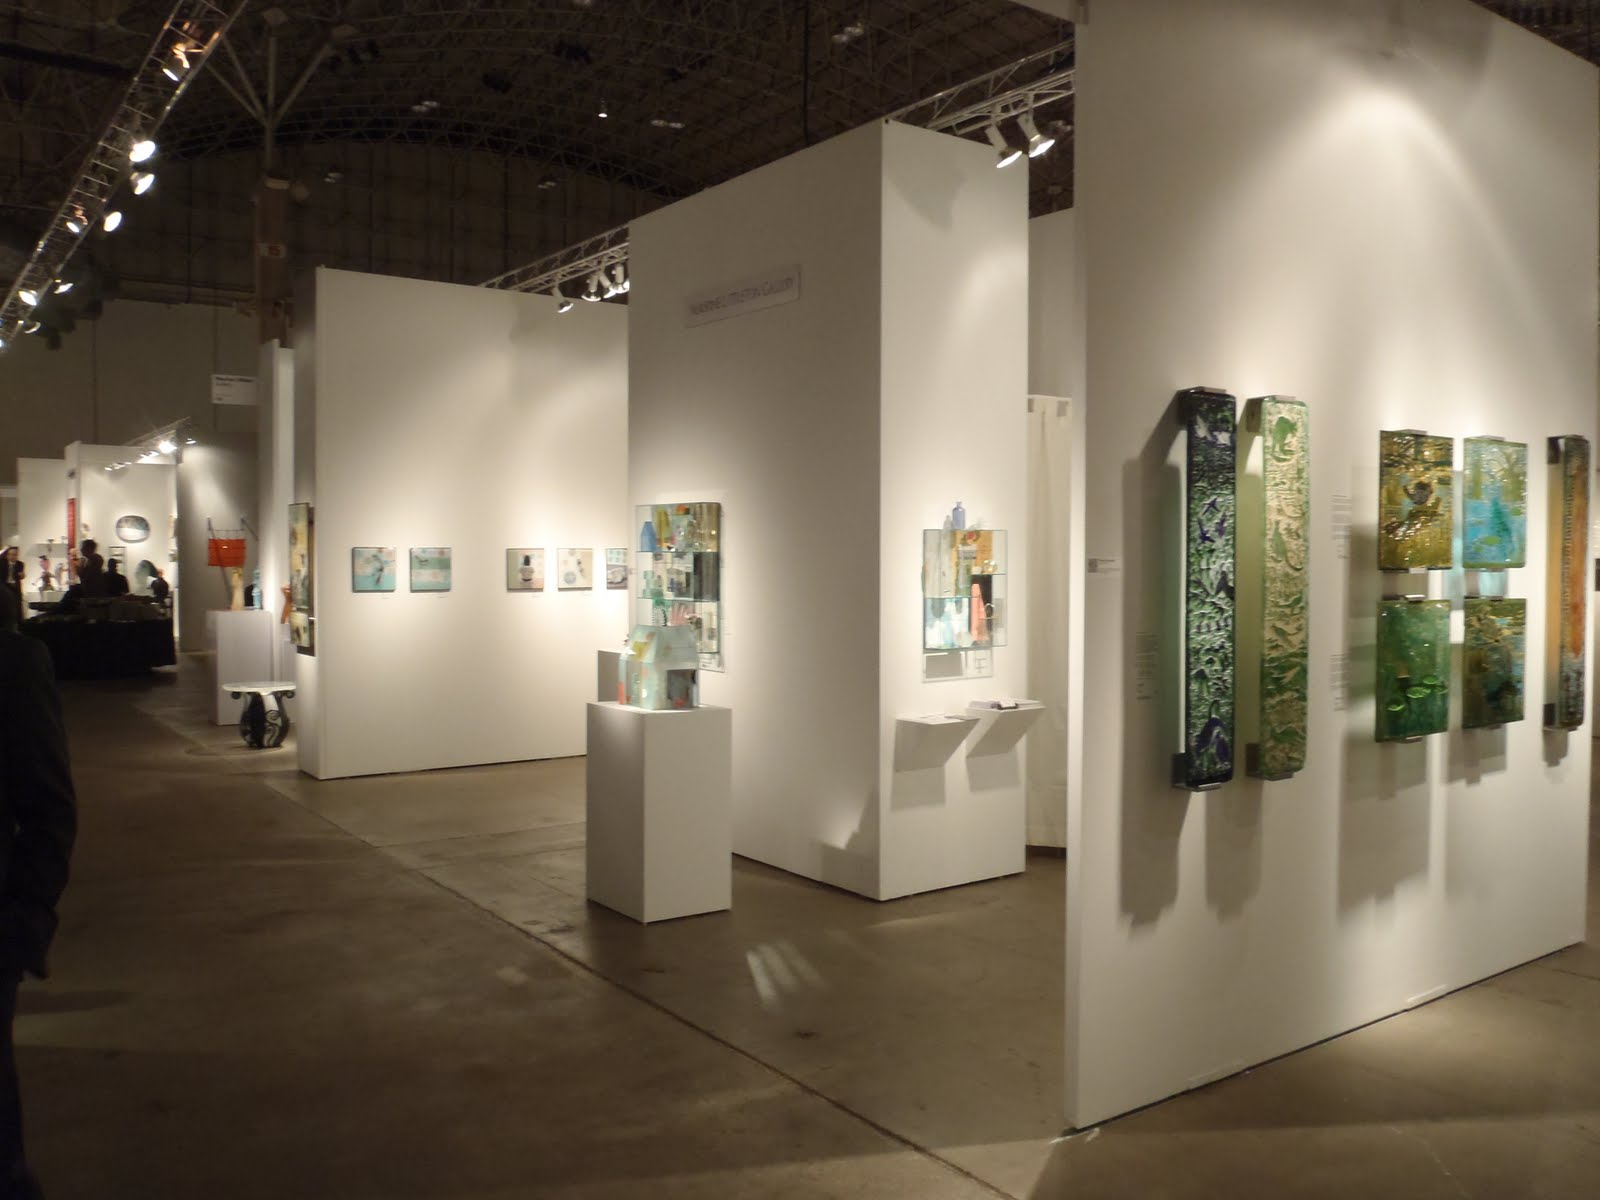 Sofa Art Gallery Loft Miami Fl Washington Glass School Report From Chicago